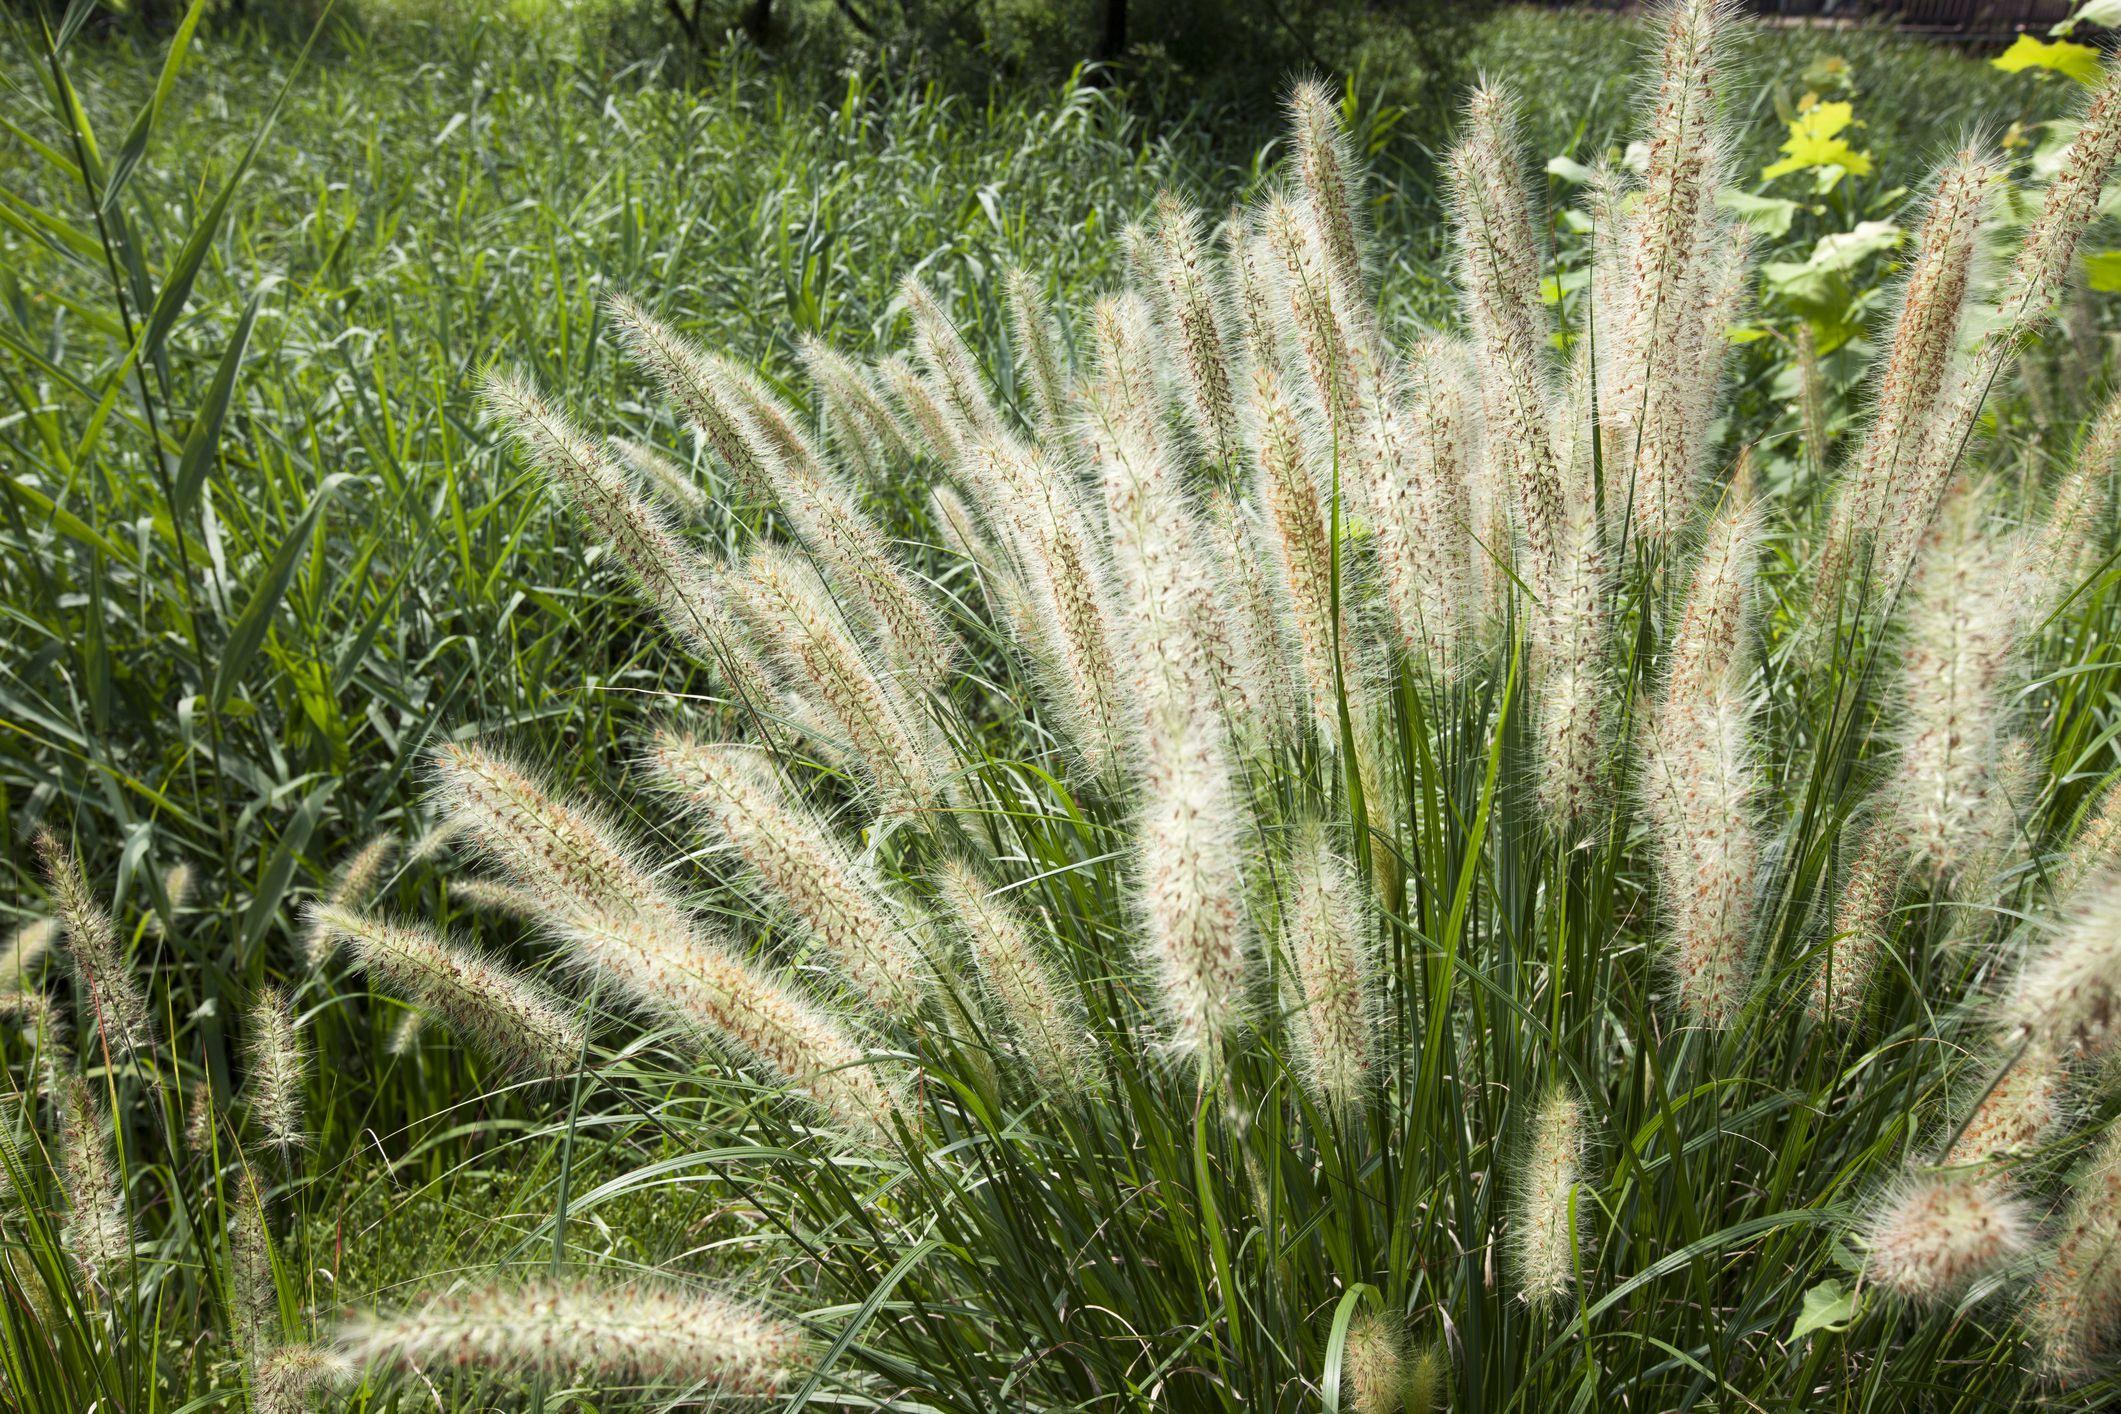 Fountain grass (Pennisetum)